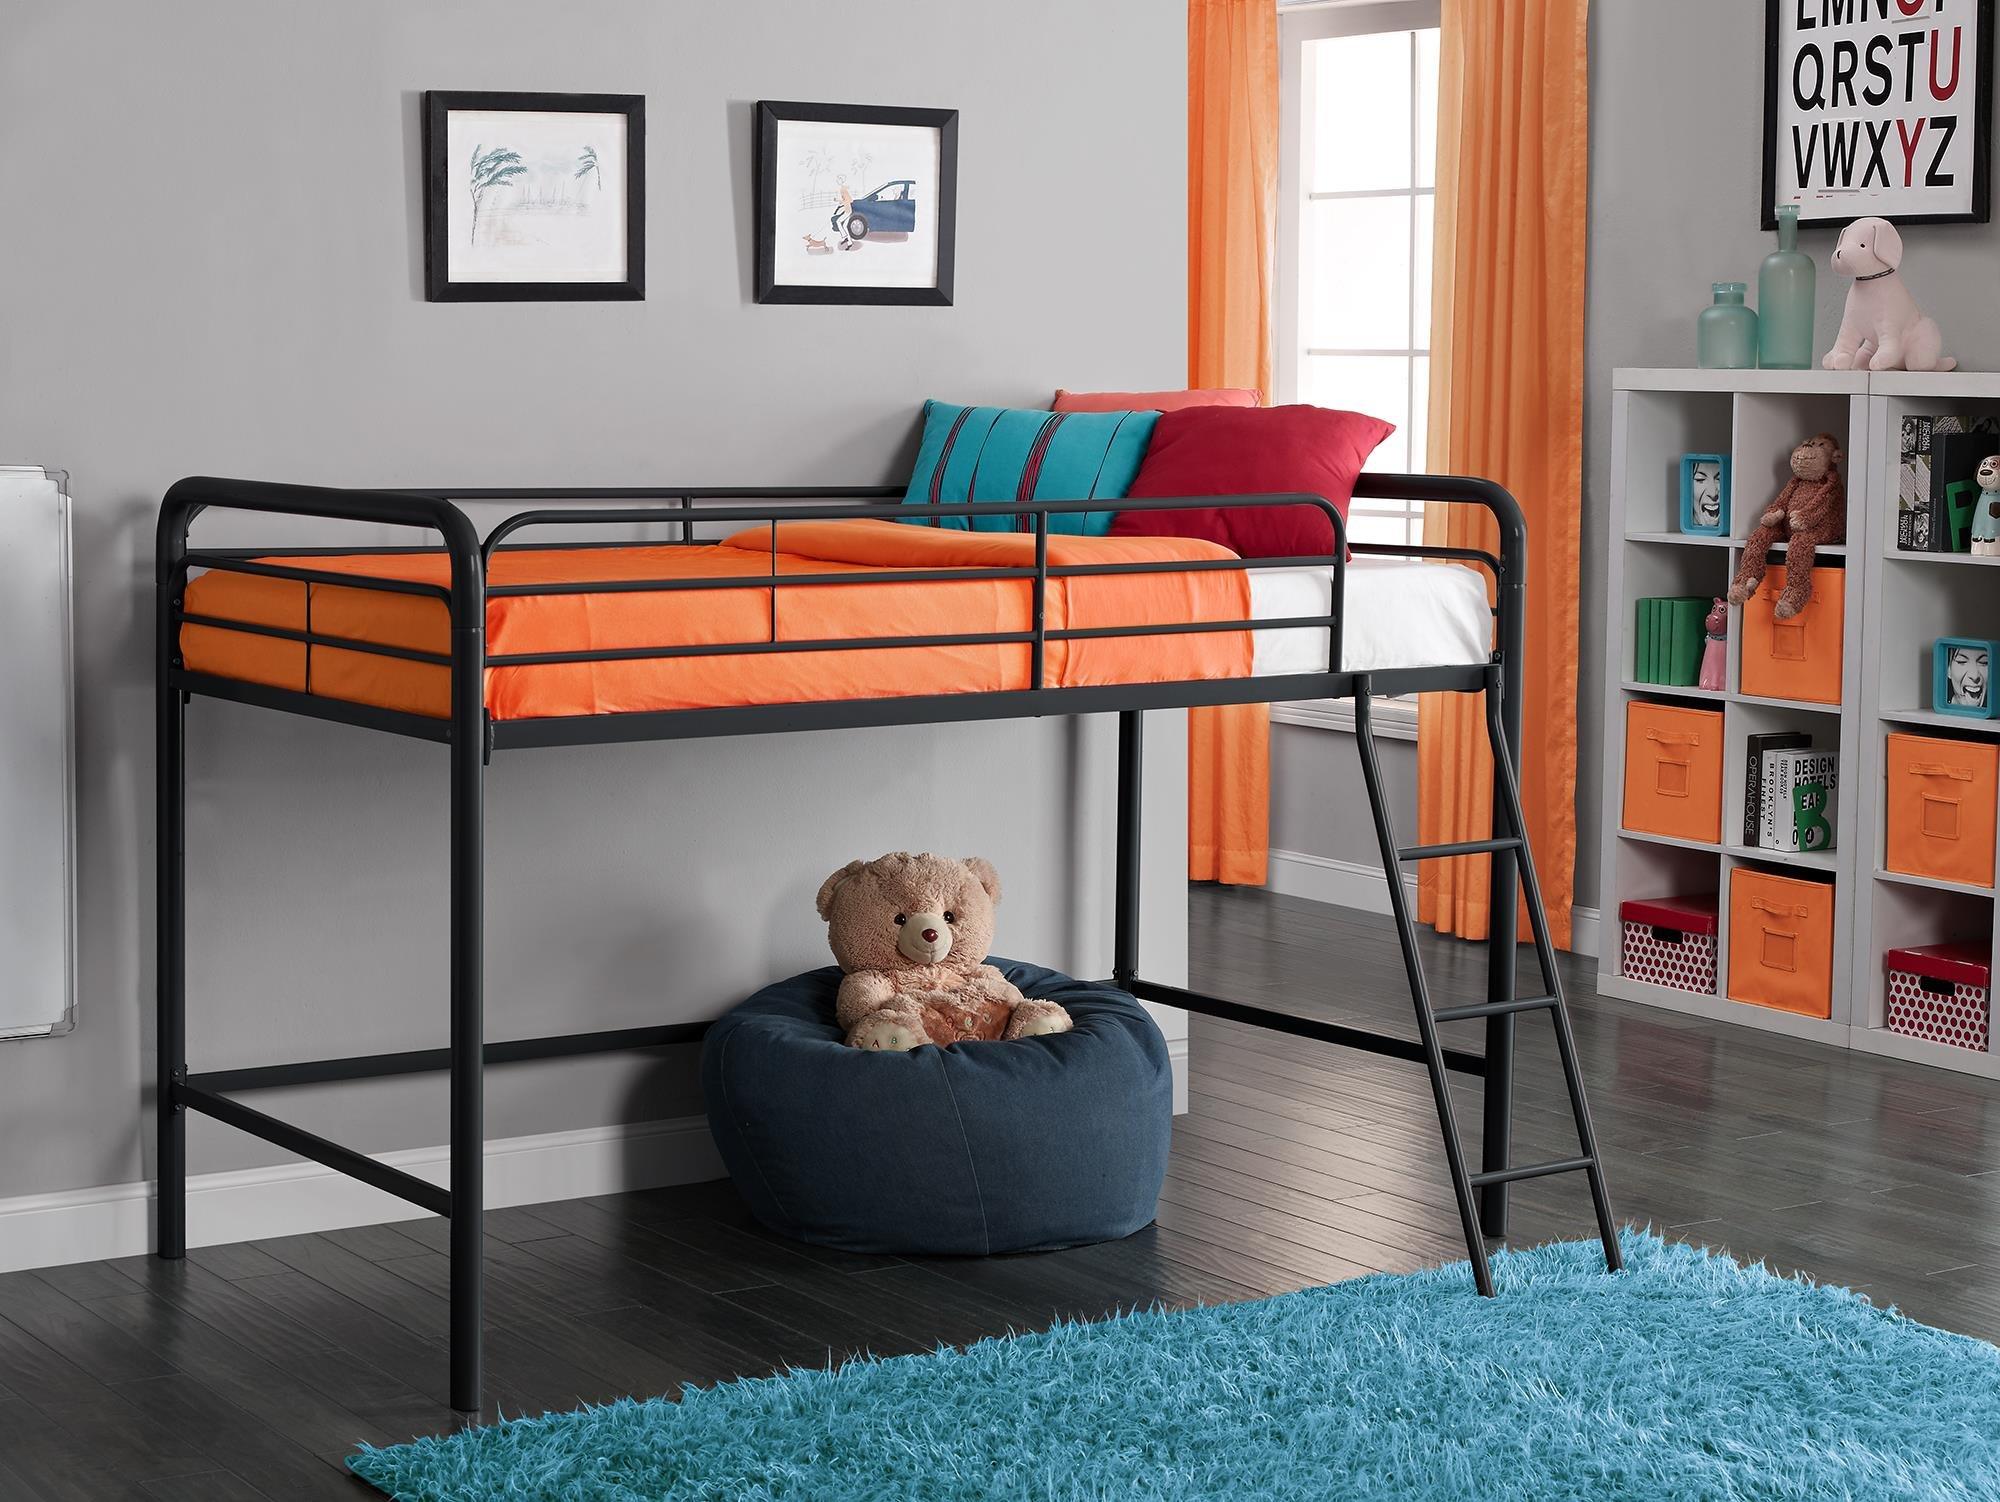 Bunk Beds Under 200 Dollars Amazon Com